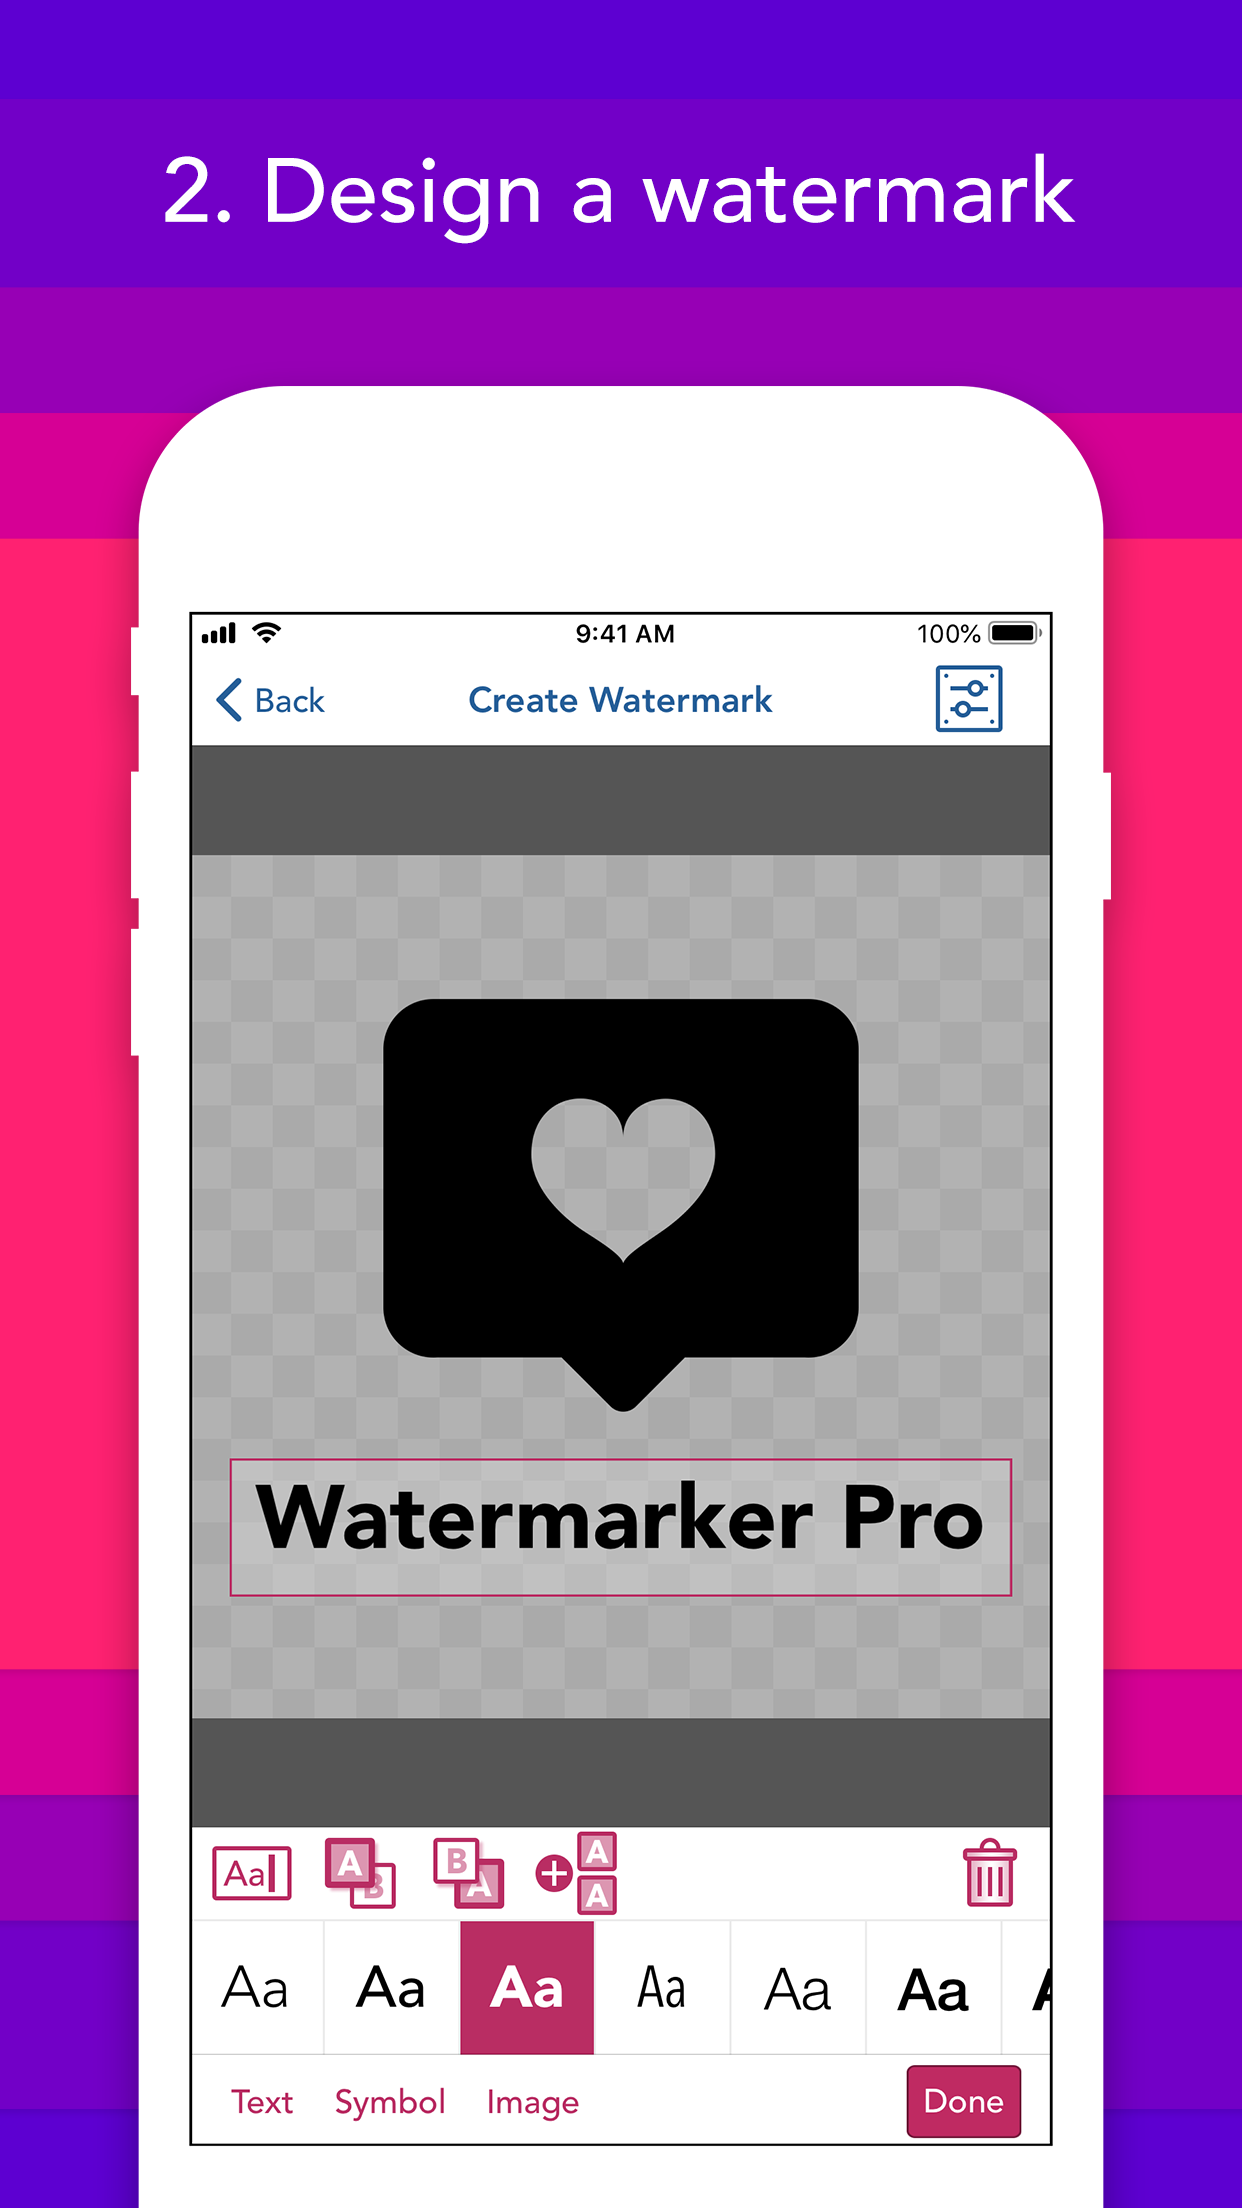 Create a watermark